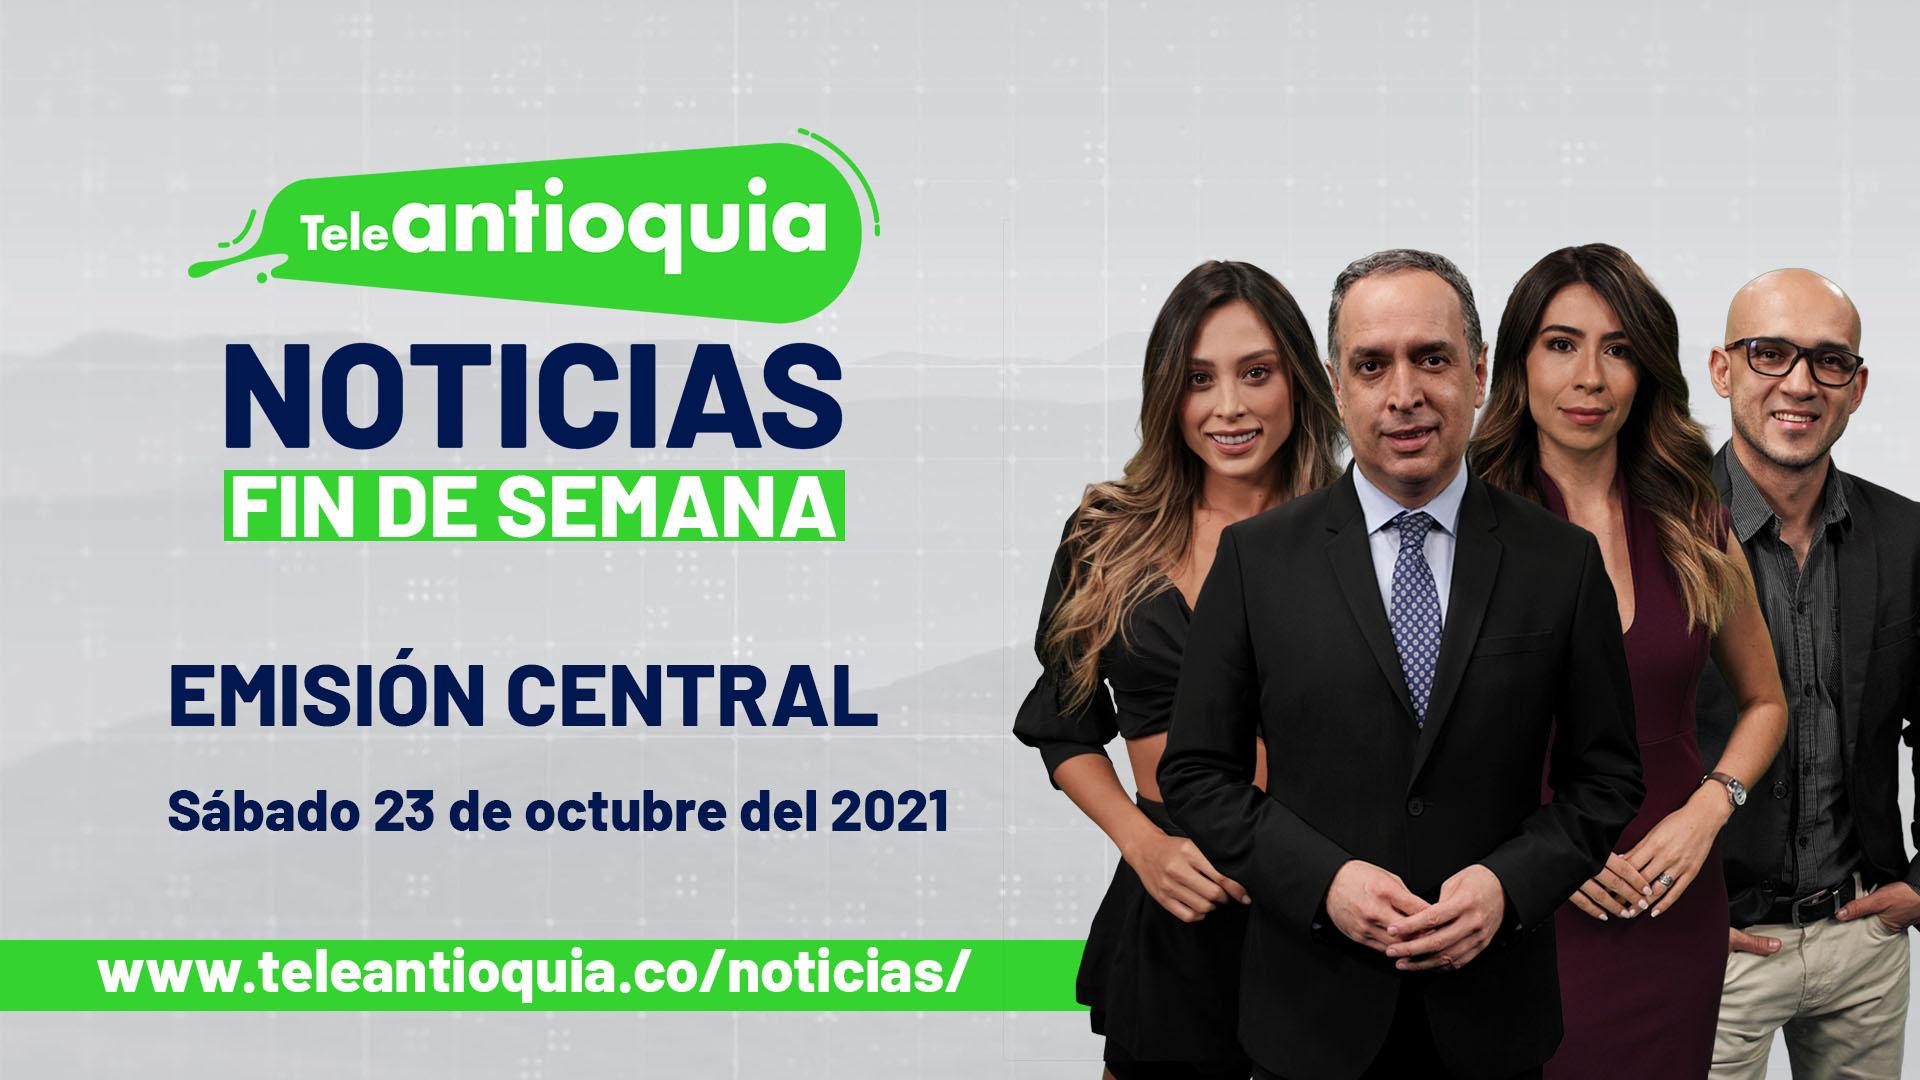 Teleantioquia Noticias – sábado 23 de octubre de 2021 noche